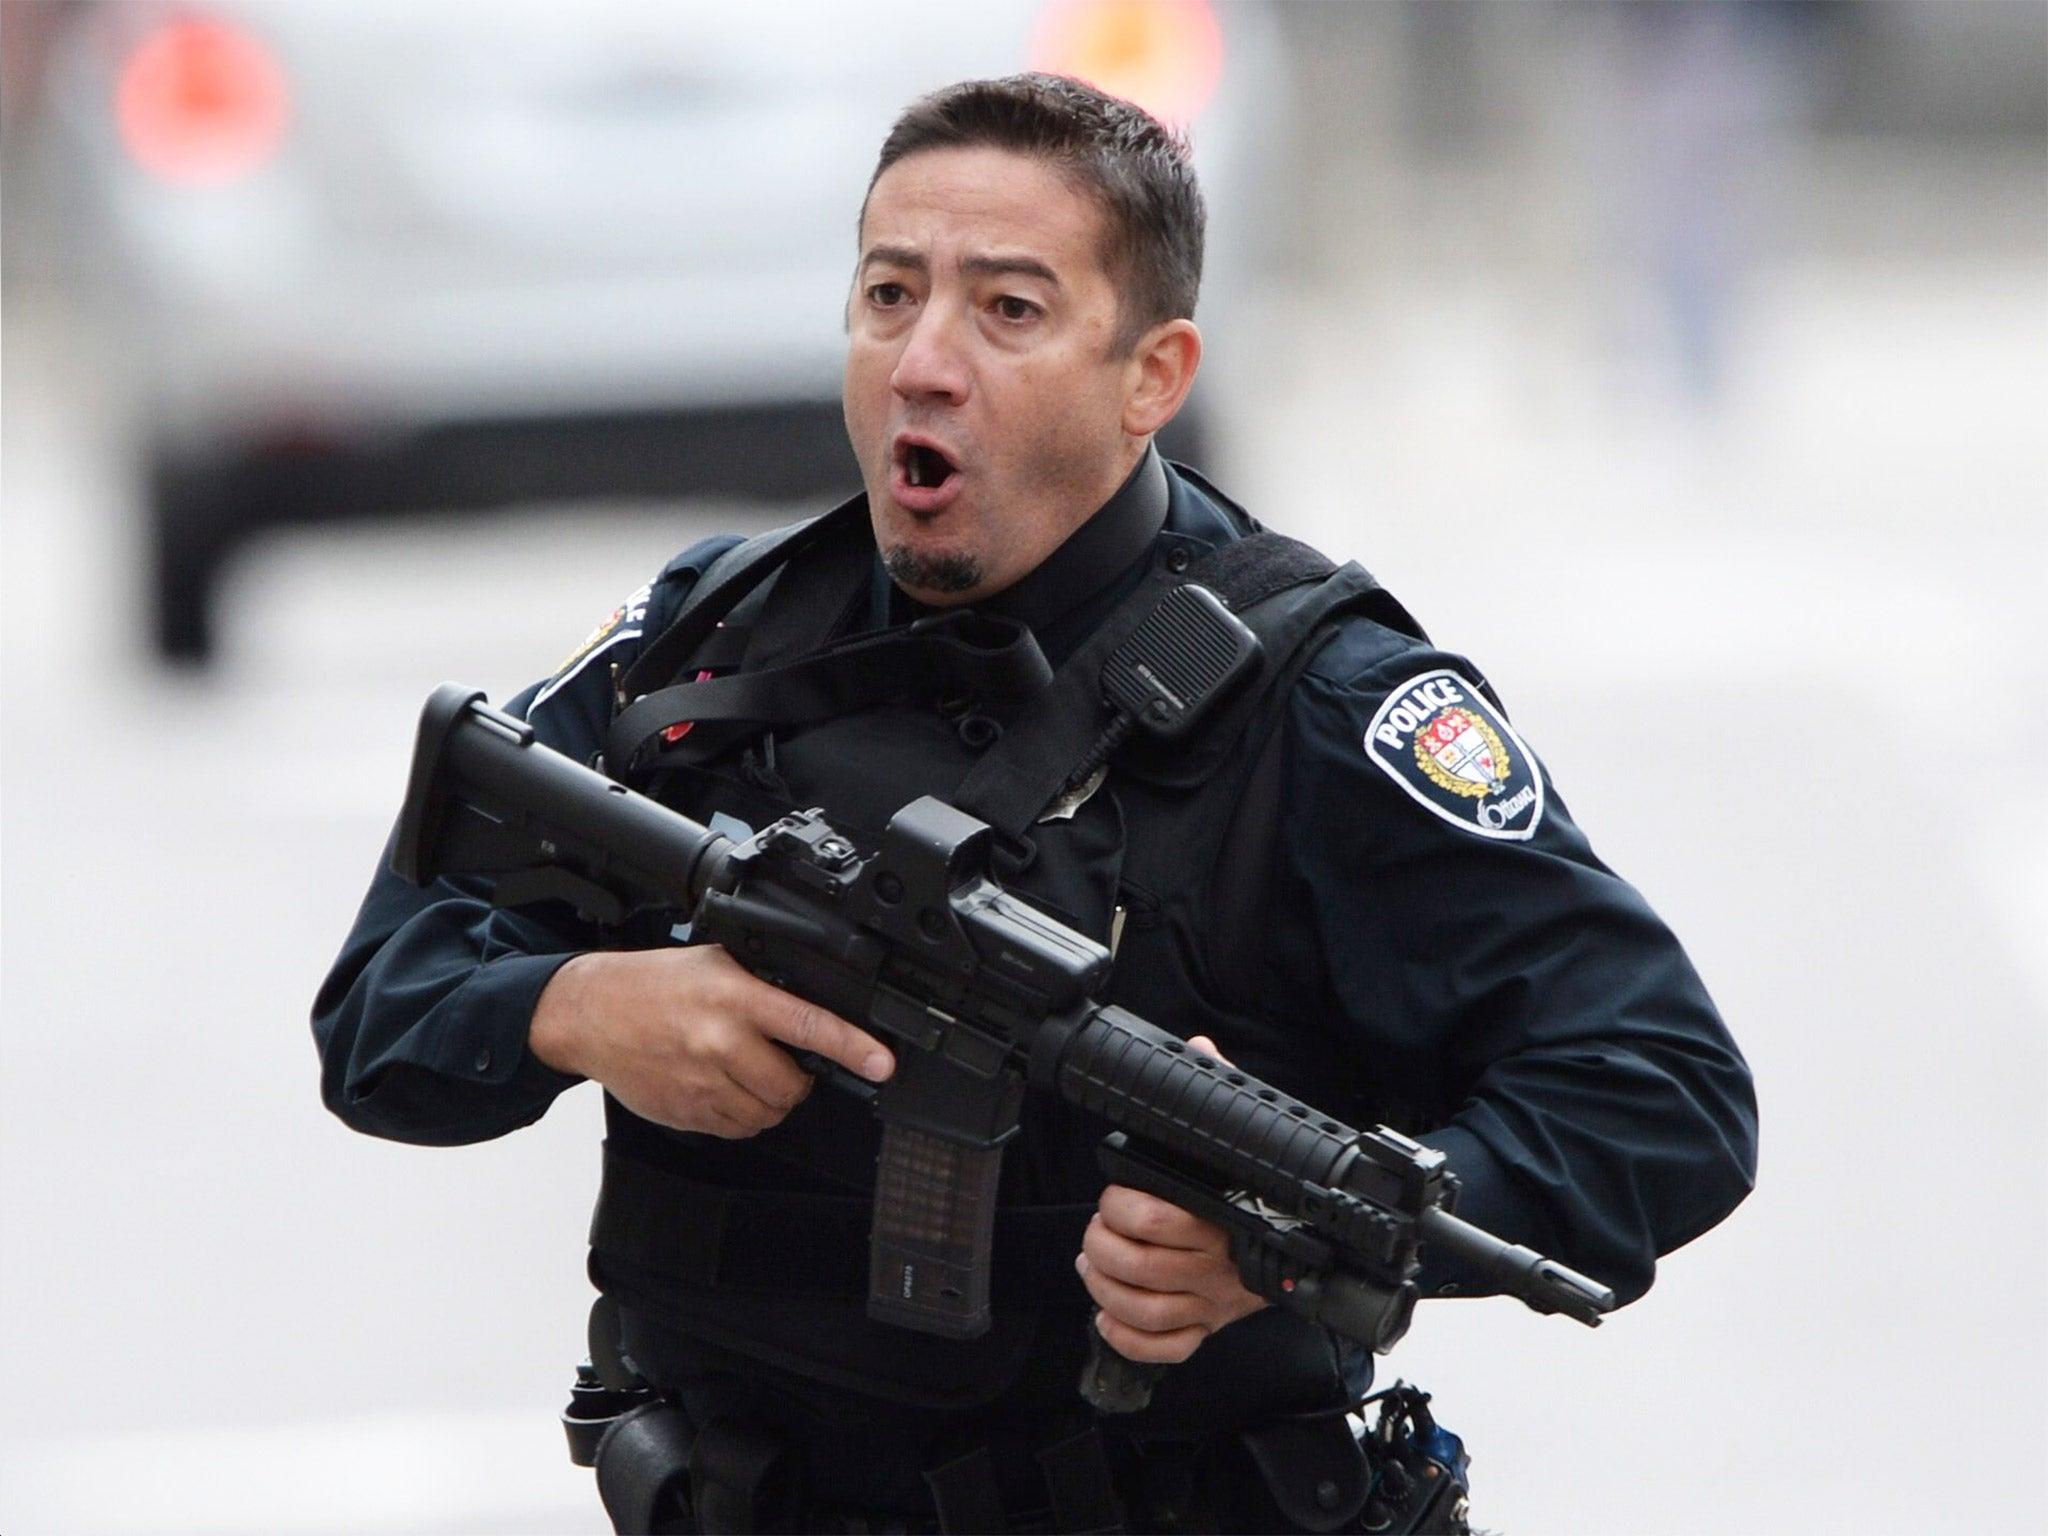 Ottawa shooting: 'Sergeant-at-arms Kevin Vickers shot